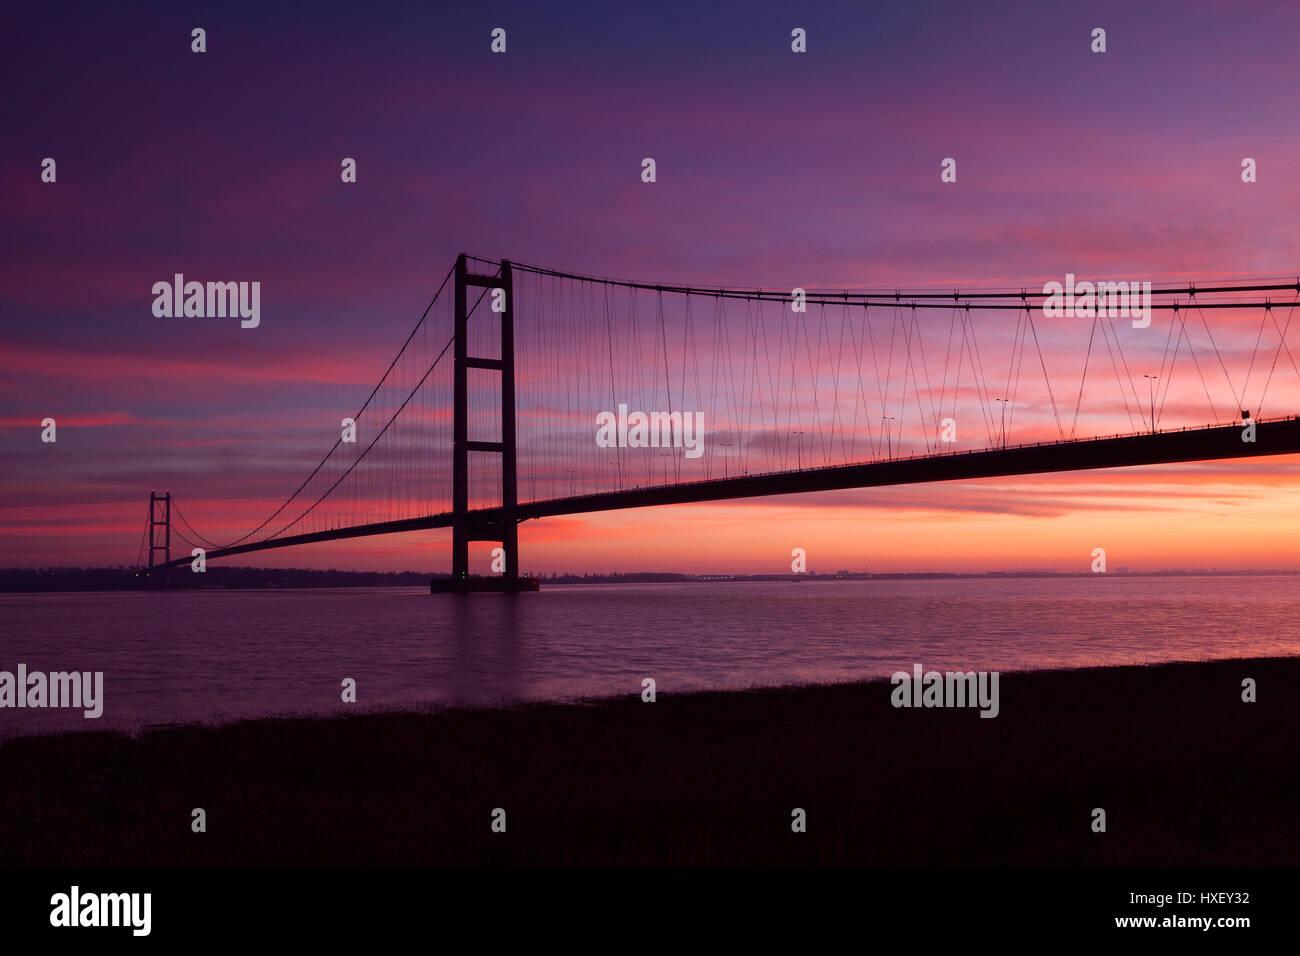 Barton-upon-Humber, North Lincolnshire, UK. 26. März 2017. Die Humber-Brücke bei Sonnenaufgang. Stockbild